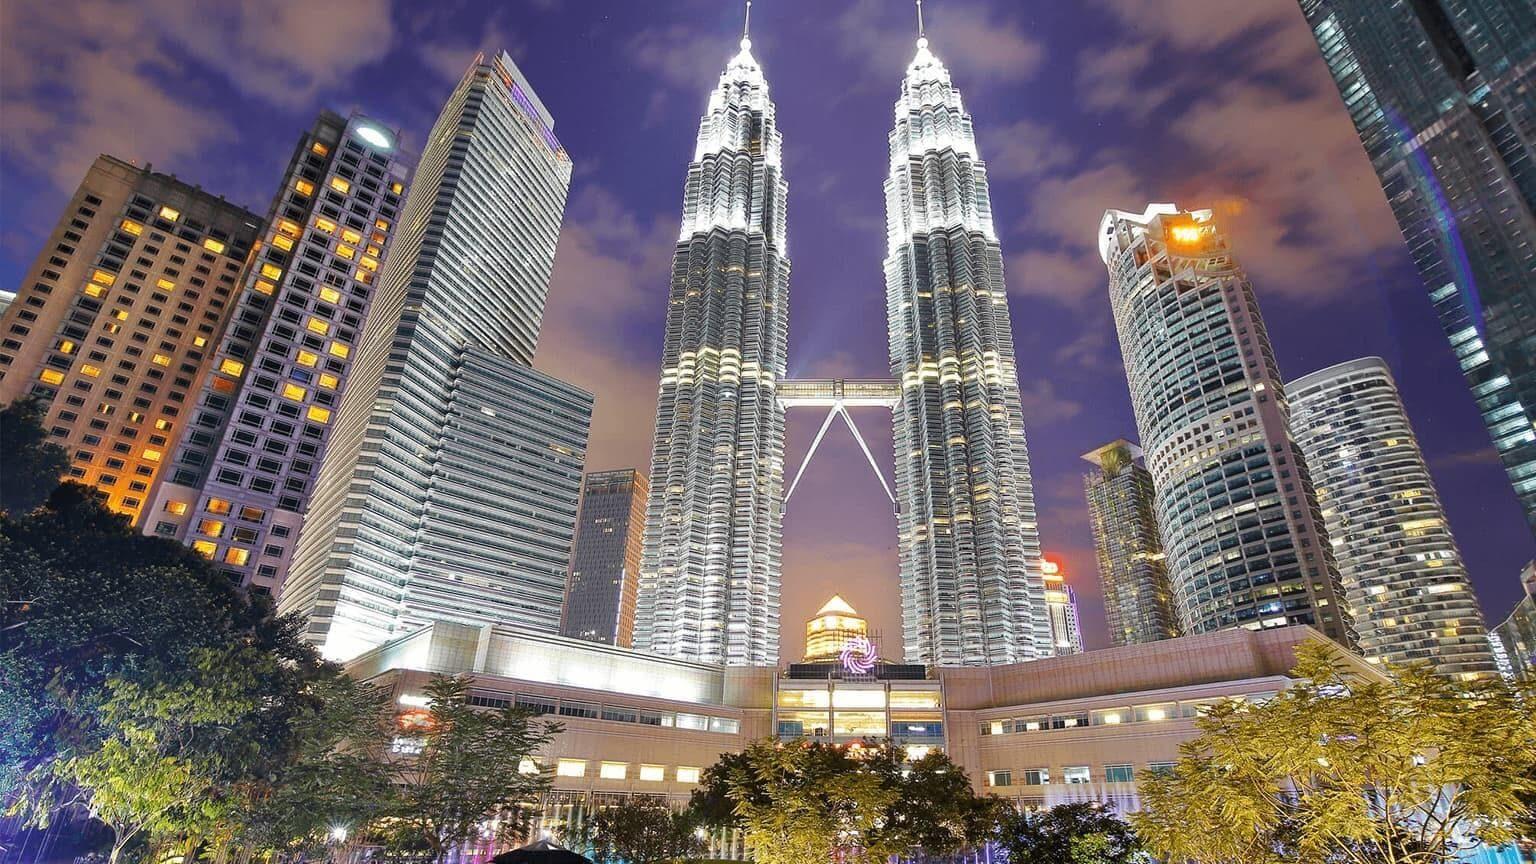 Petronas Towers glittering against nightsky